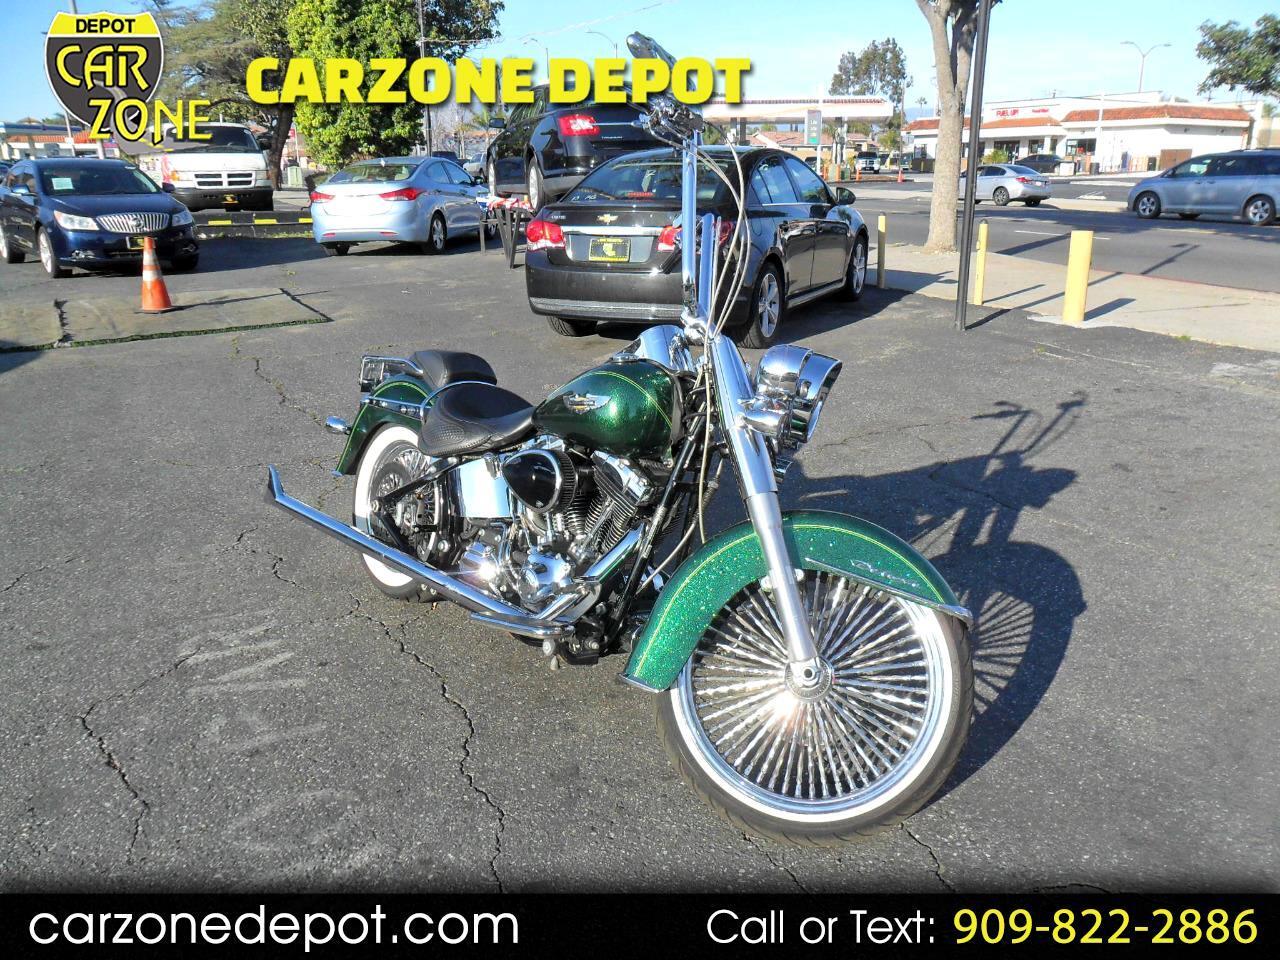 2013 Harley-Davidson FLSTN Deluxe